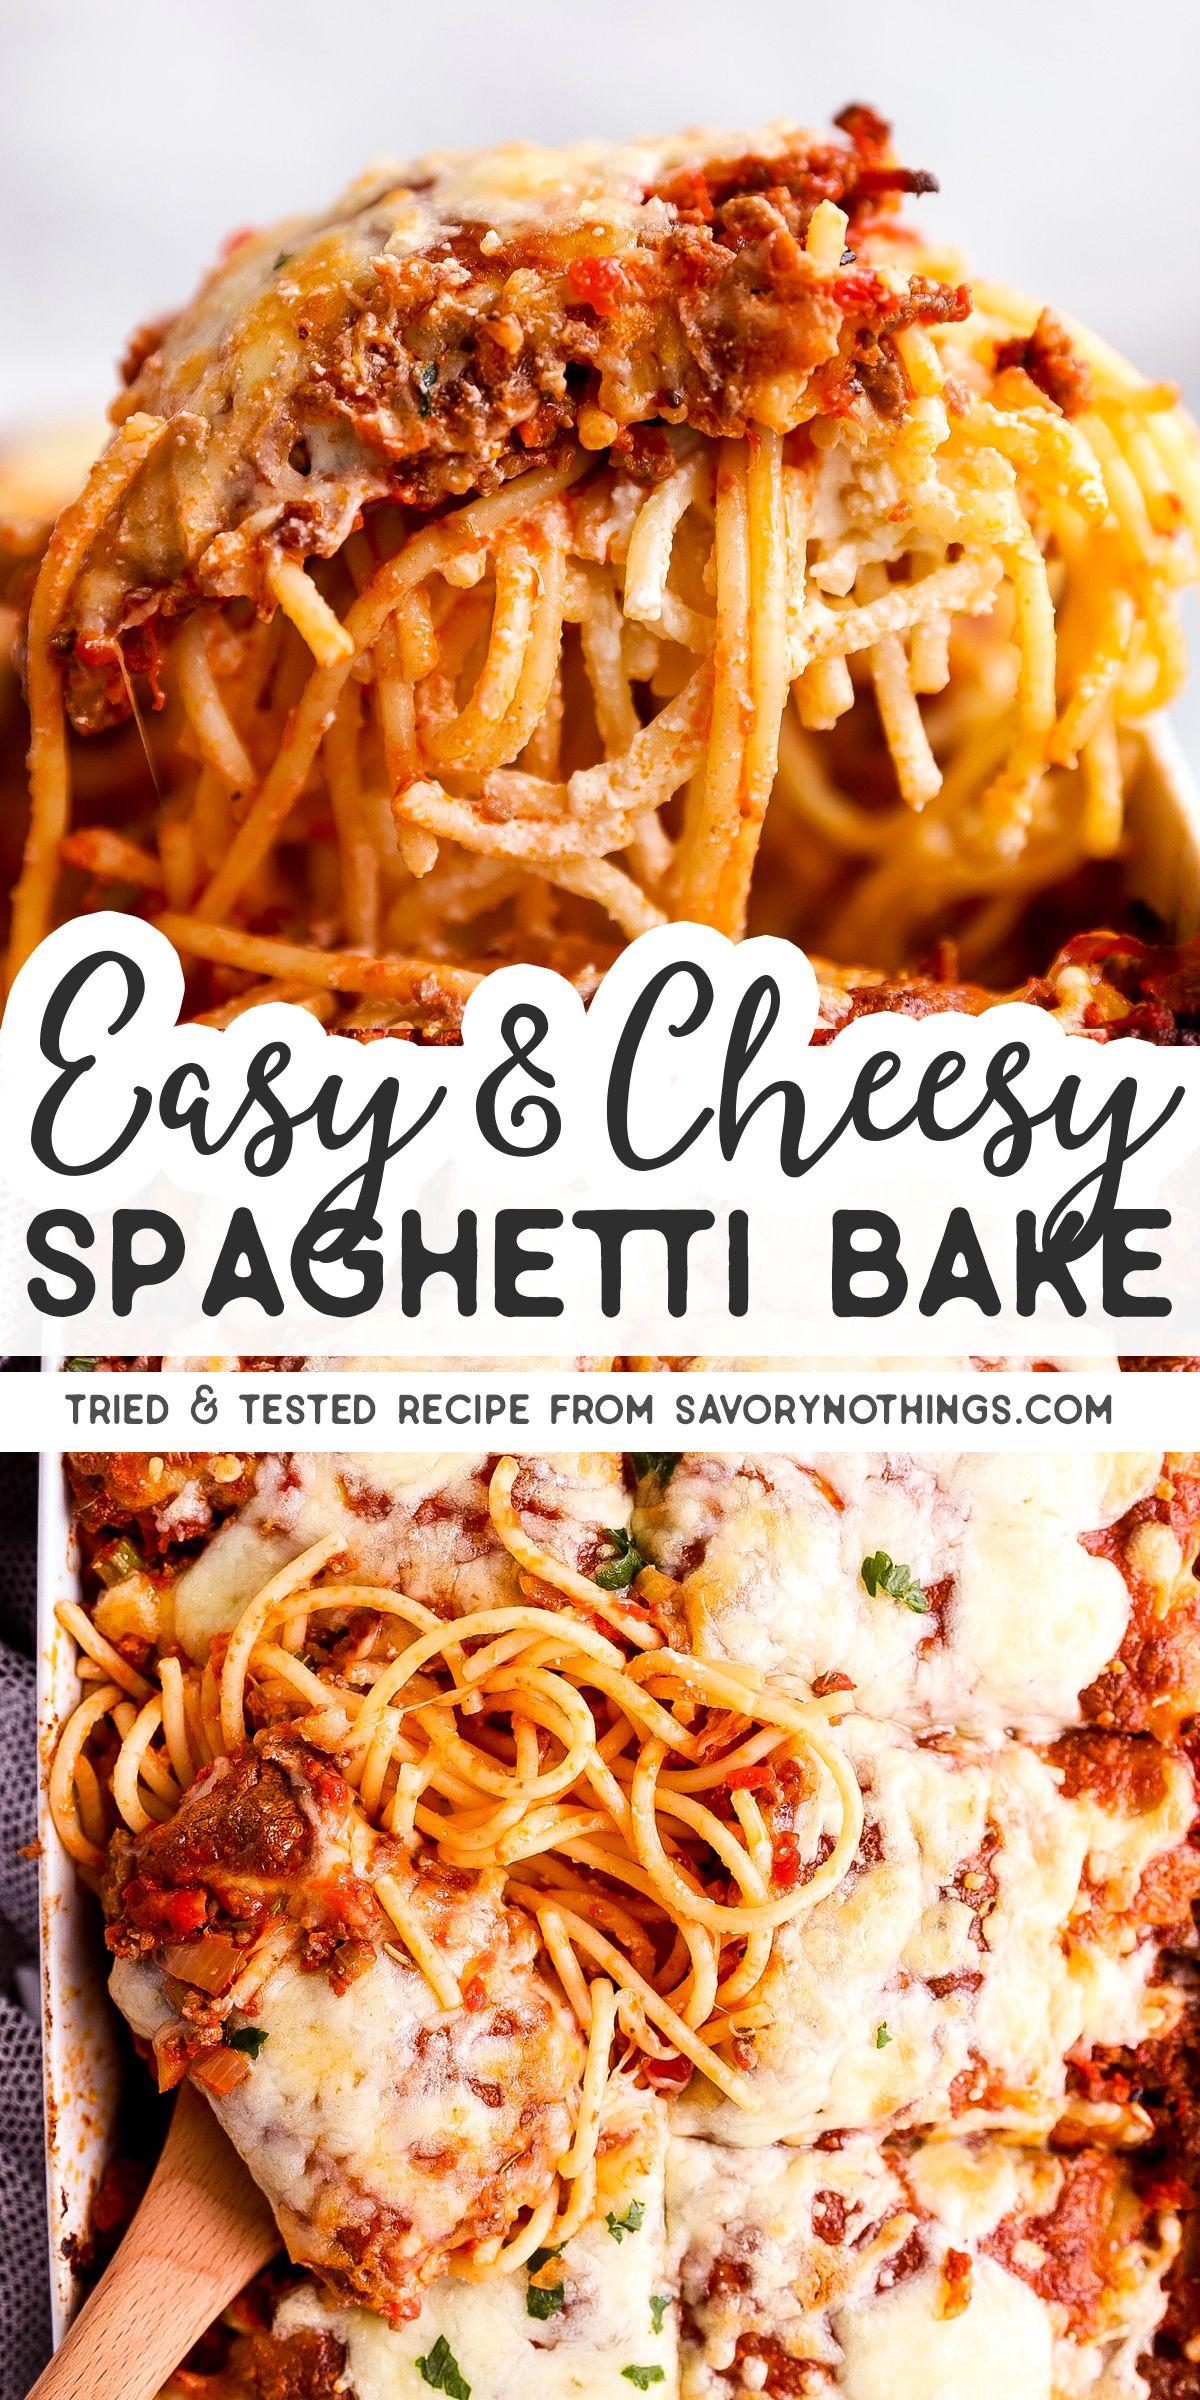 The Best Easy Cheesy Spaghetti Bake Spaghetti Recipes Easy Hearty Comfort Food Baked Spaghetti Casserole